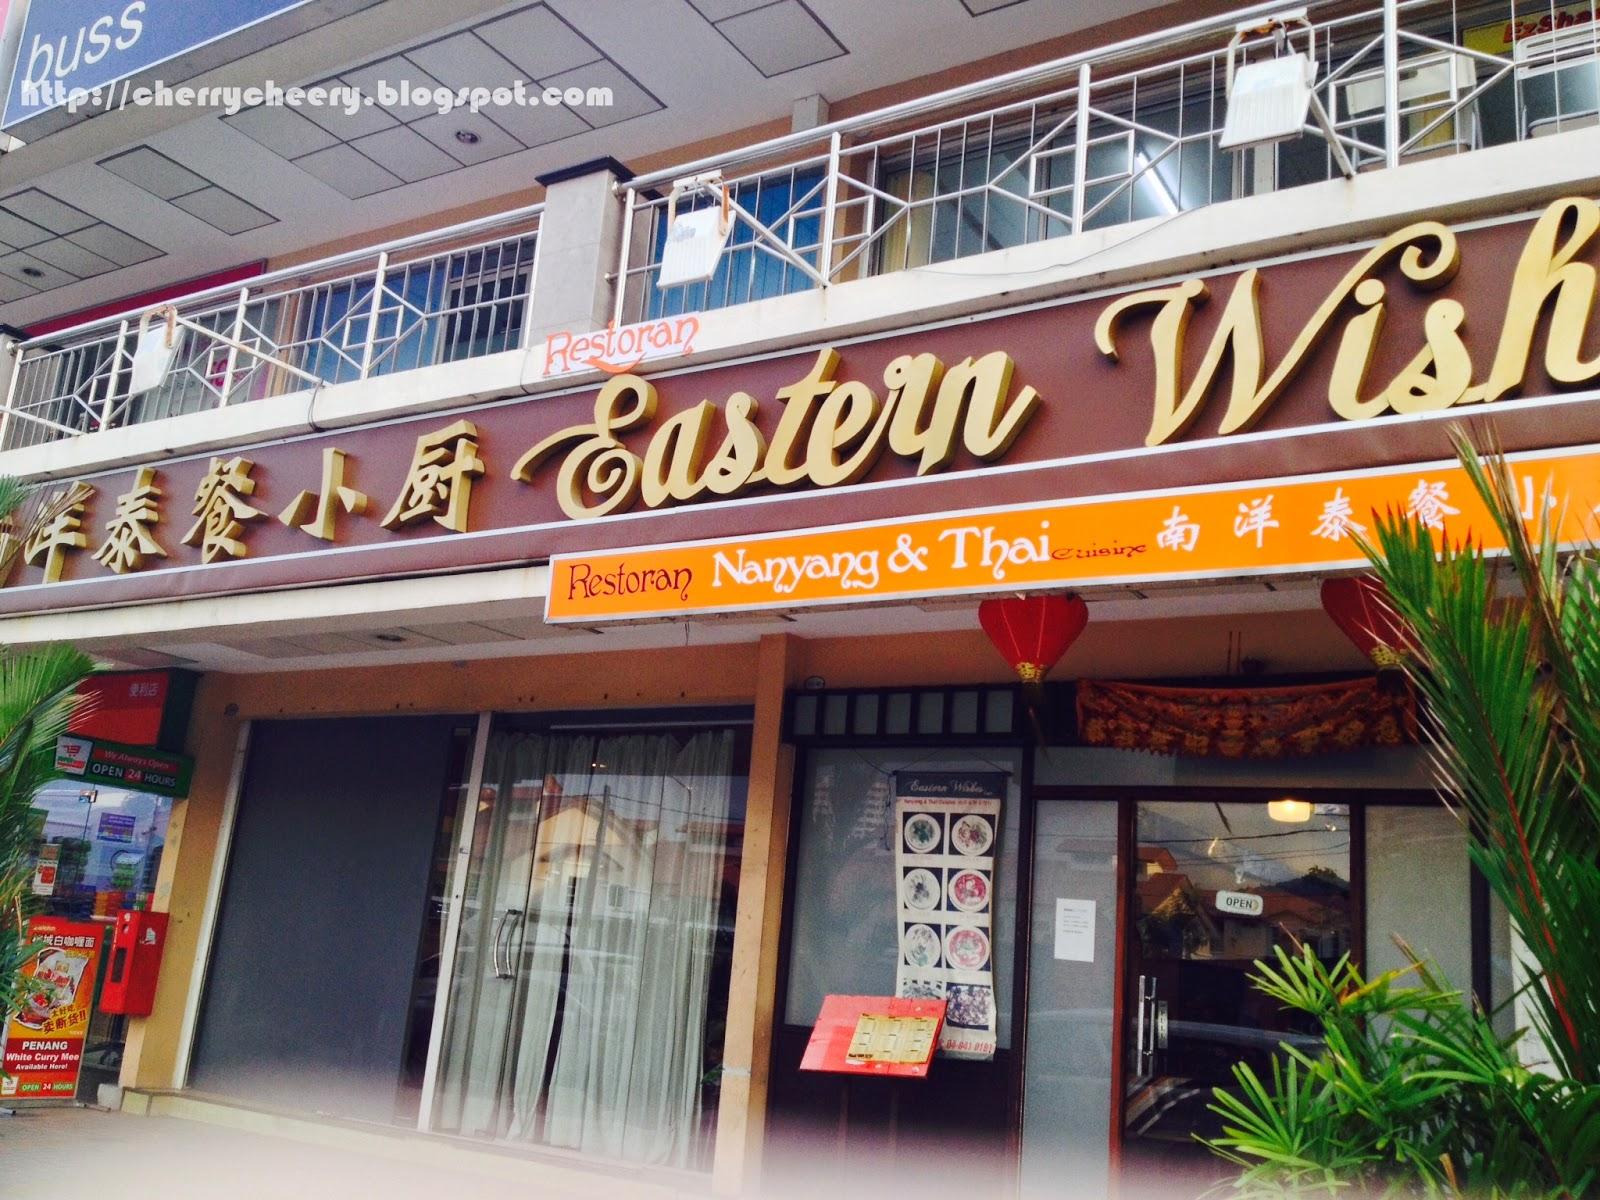 Eastern_Wishes_Restaurant